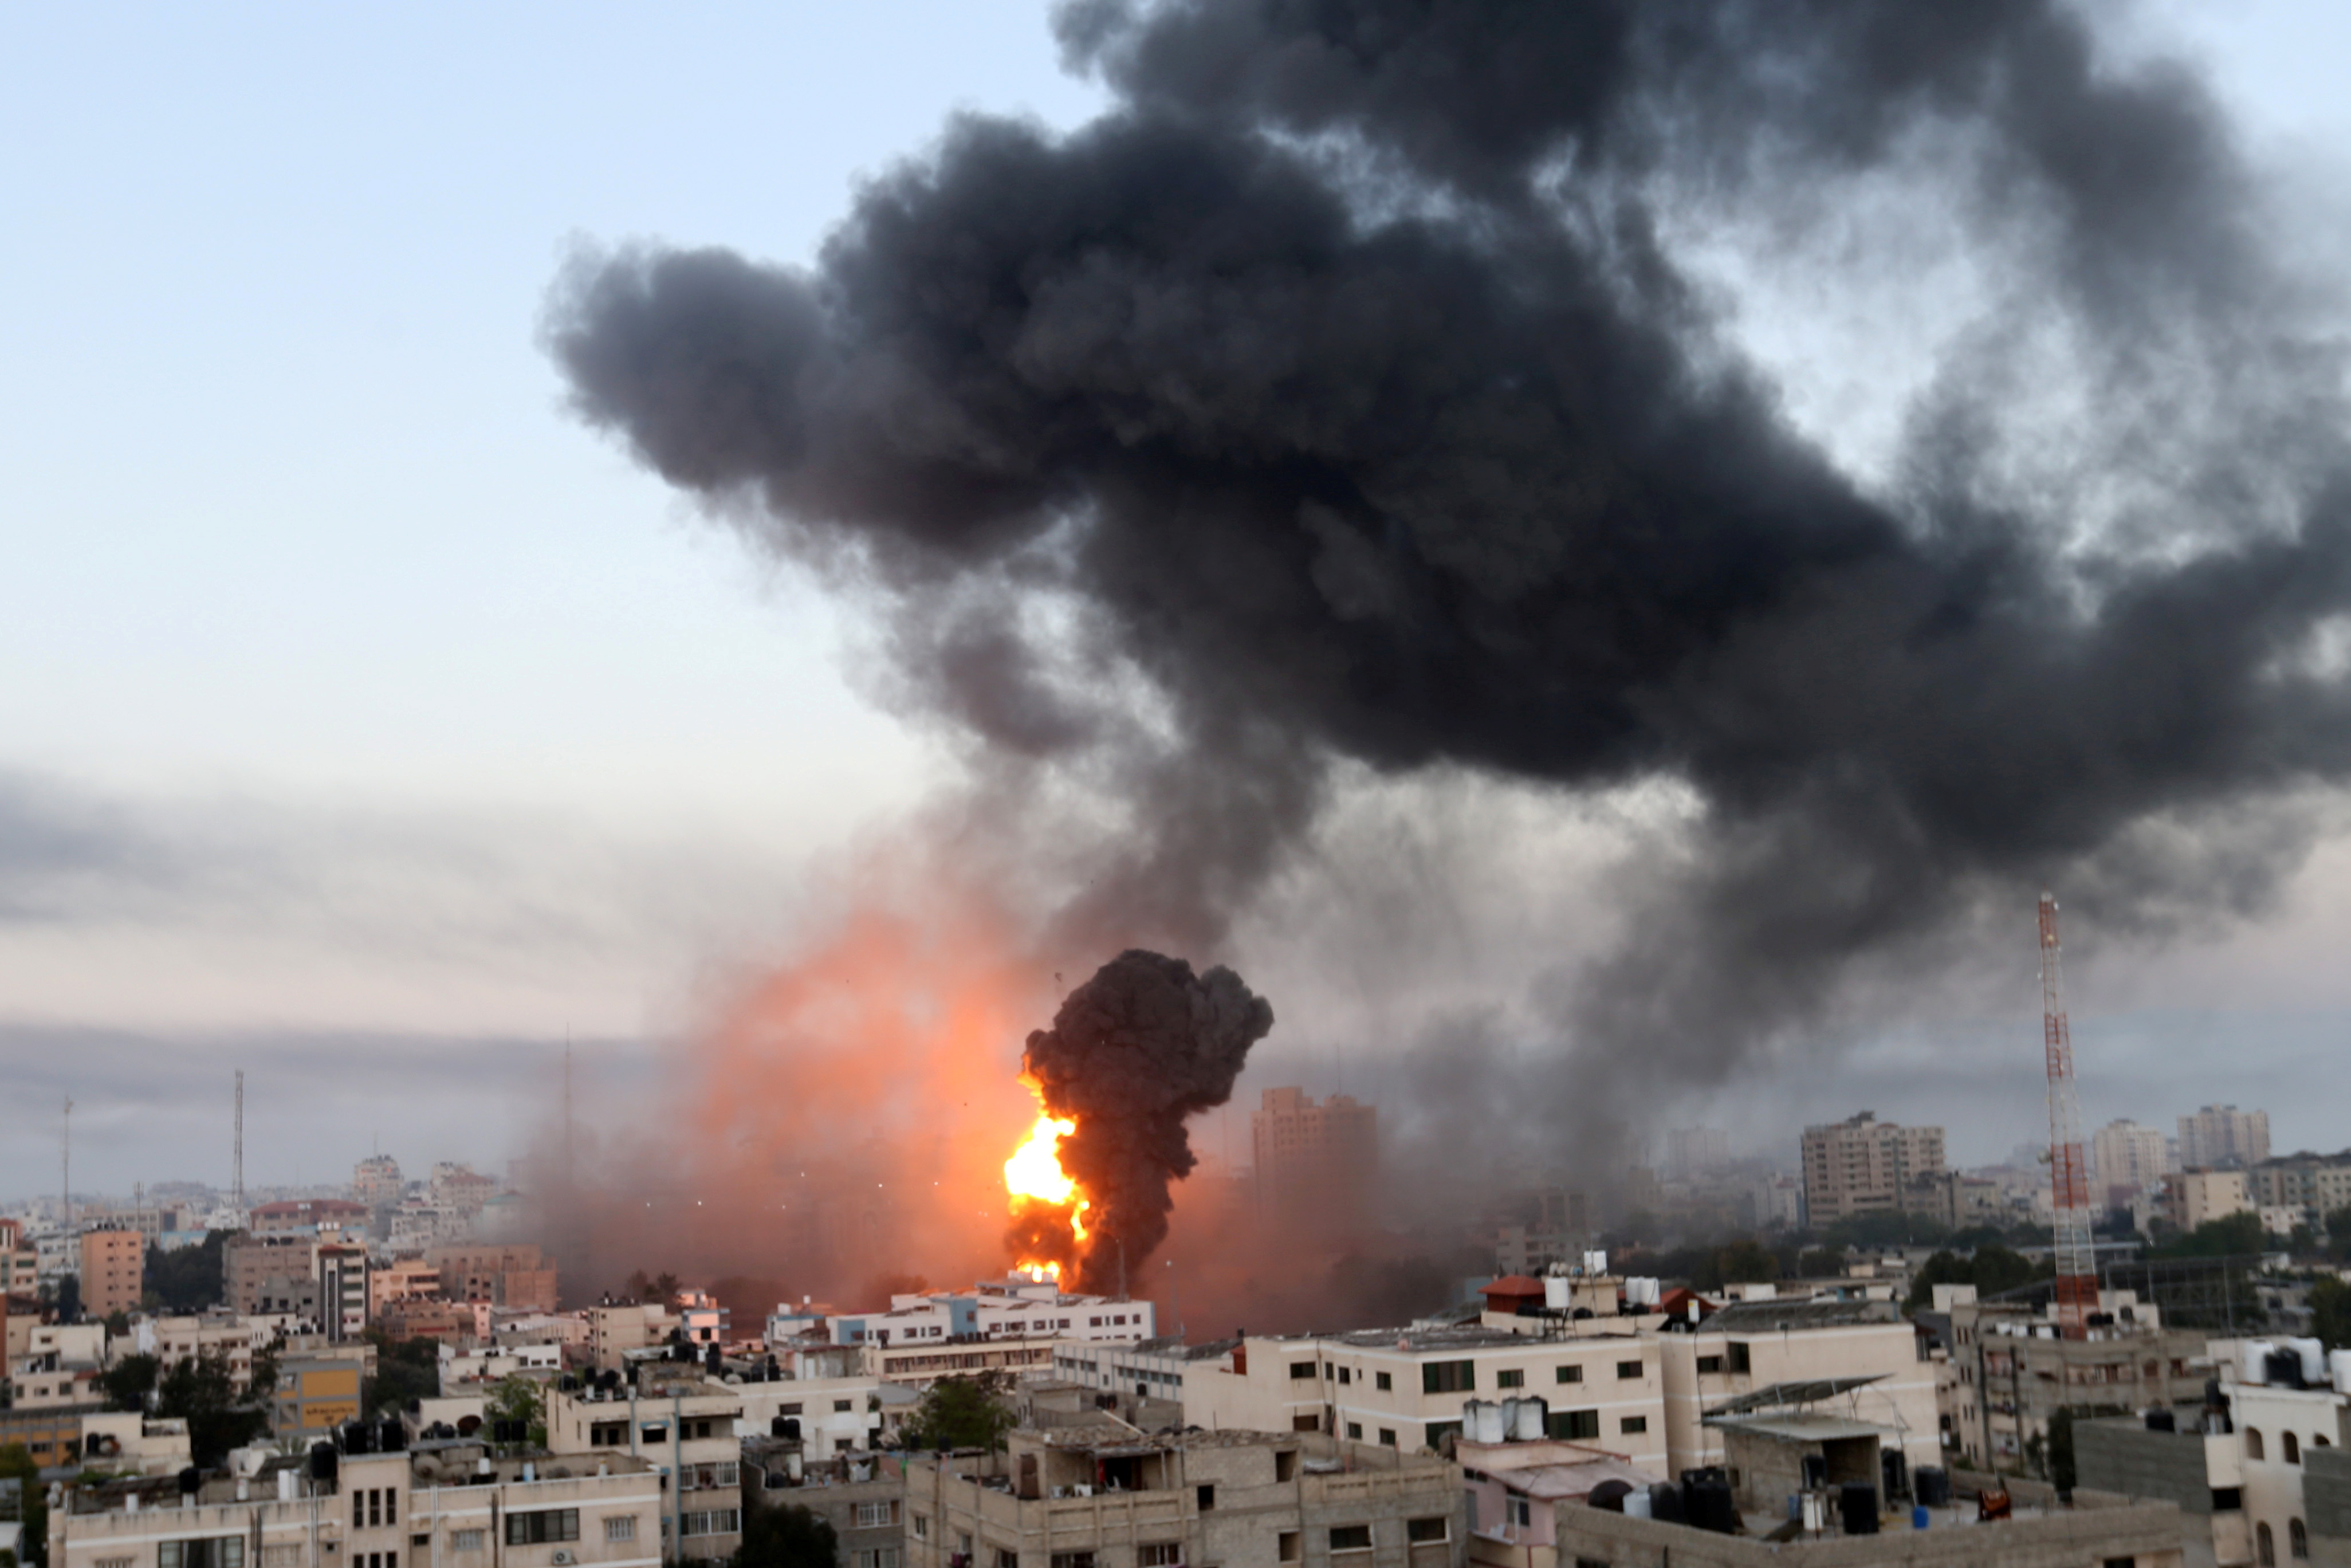 Smoke and flames rise during Israeli air strikes amid a flare-up of Israeli-Palestinian violence, in Gaza May 12, 2021. REUTERS/Ibraheem Abu Mustafa